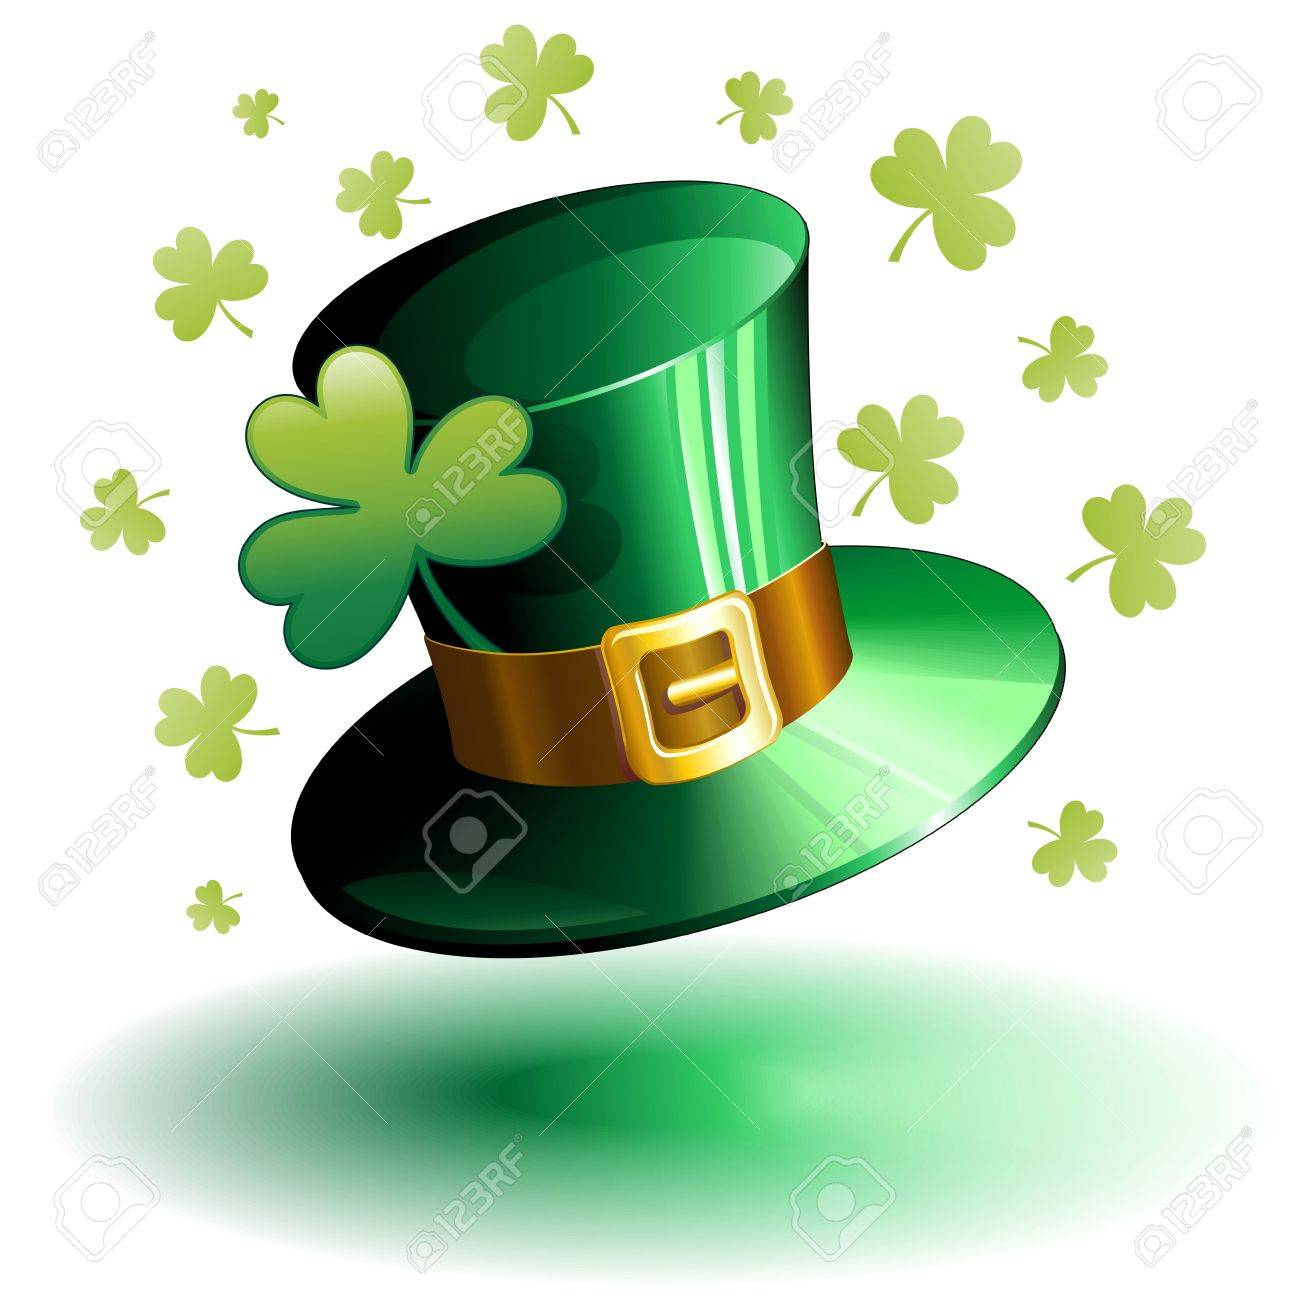 1300x1300 St Patricks Day Clovers